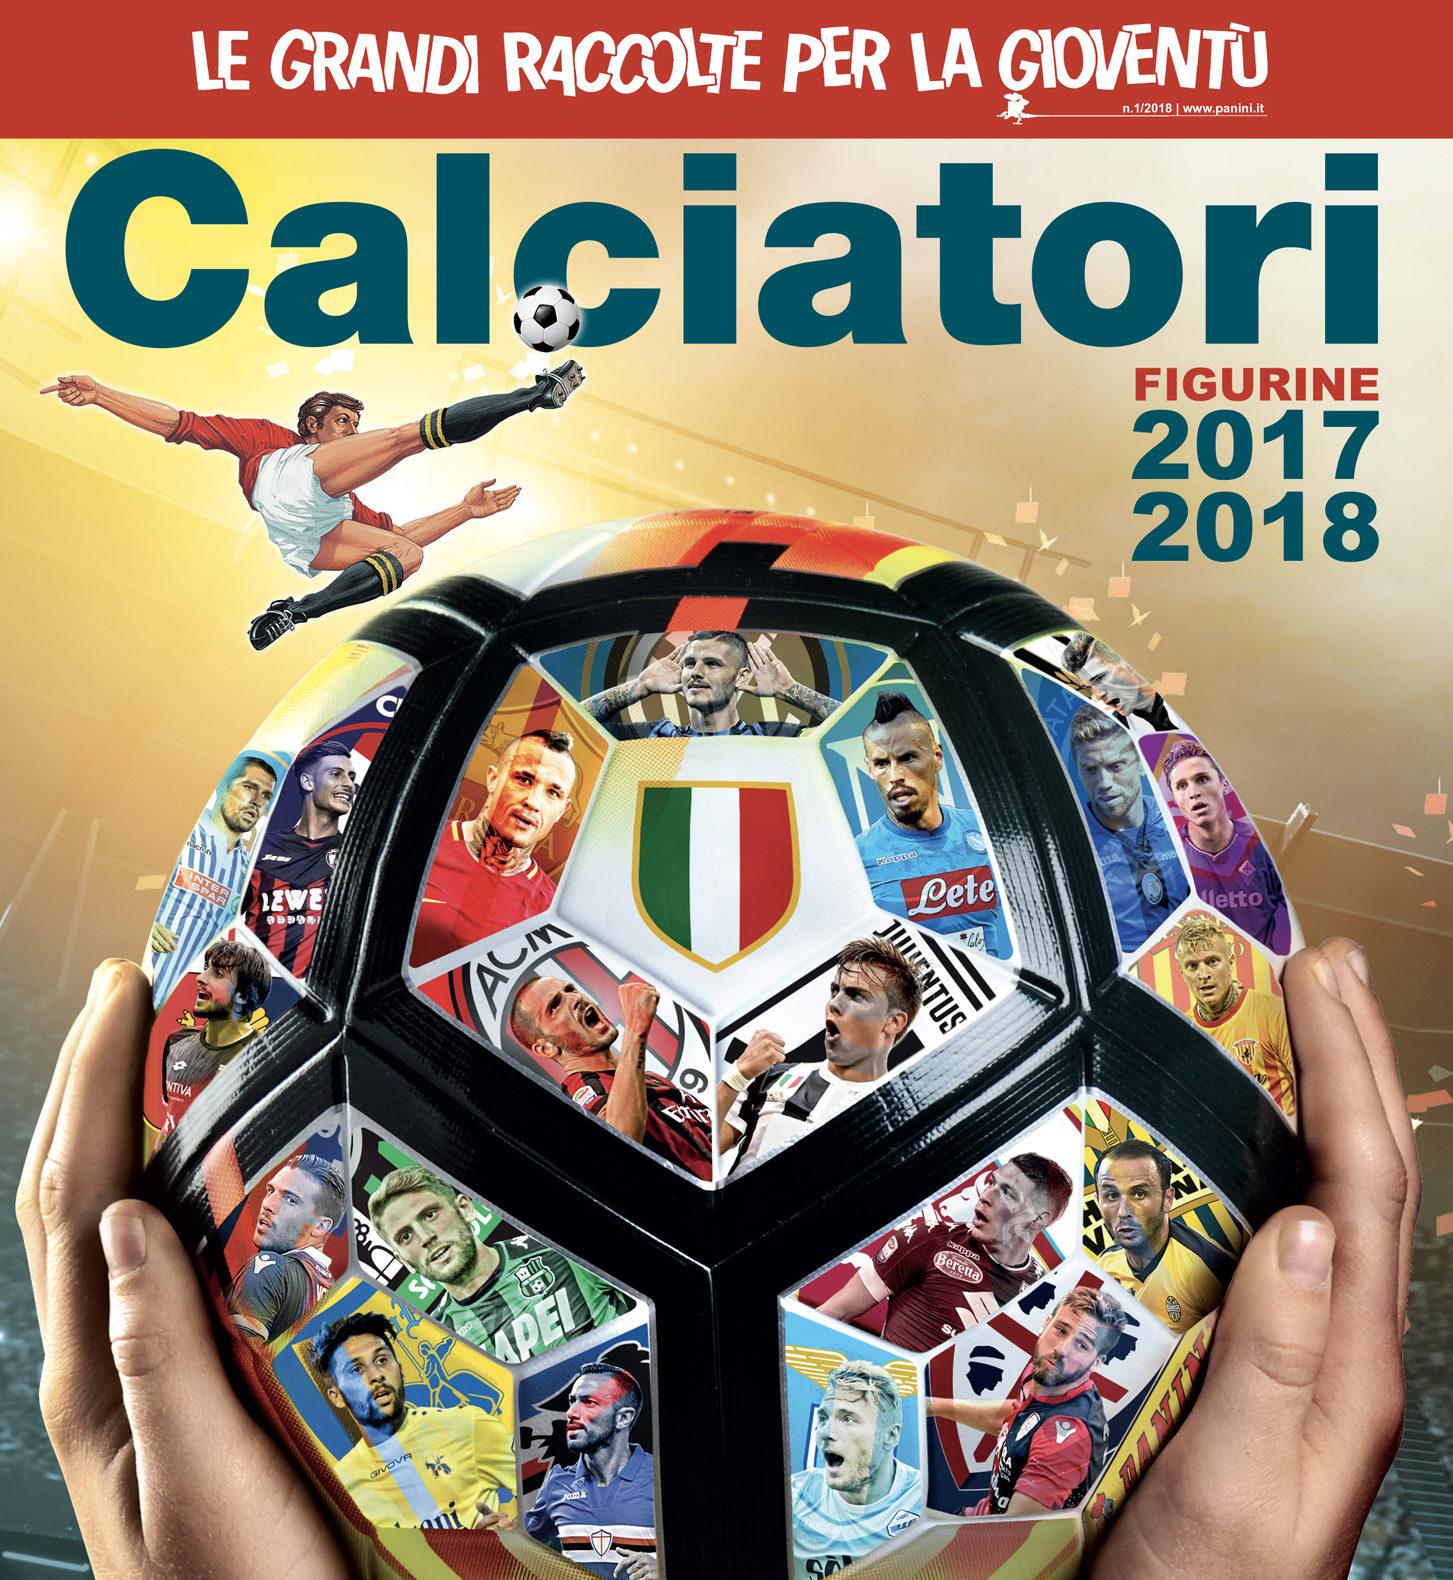 https://www.promotionmagazine.it/wp/wp-content/uploads/2018/02/Copertina-Calciatori-Panini-2017-2018-e1519125883717.jpg